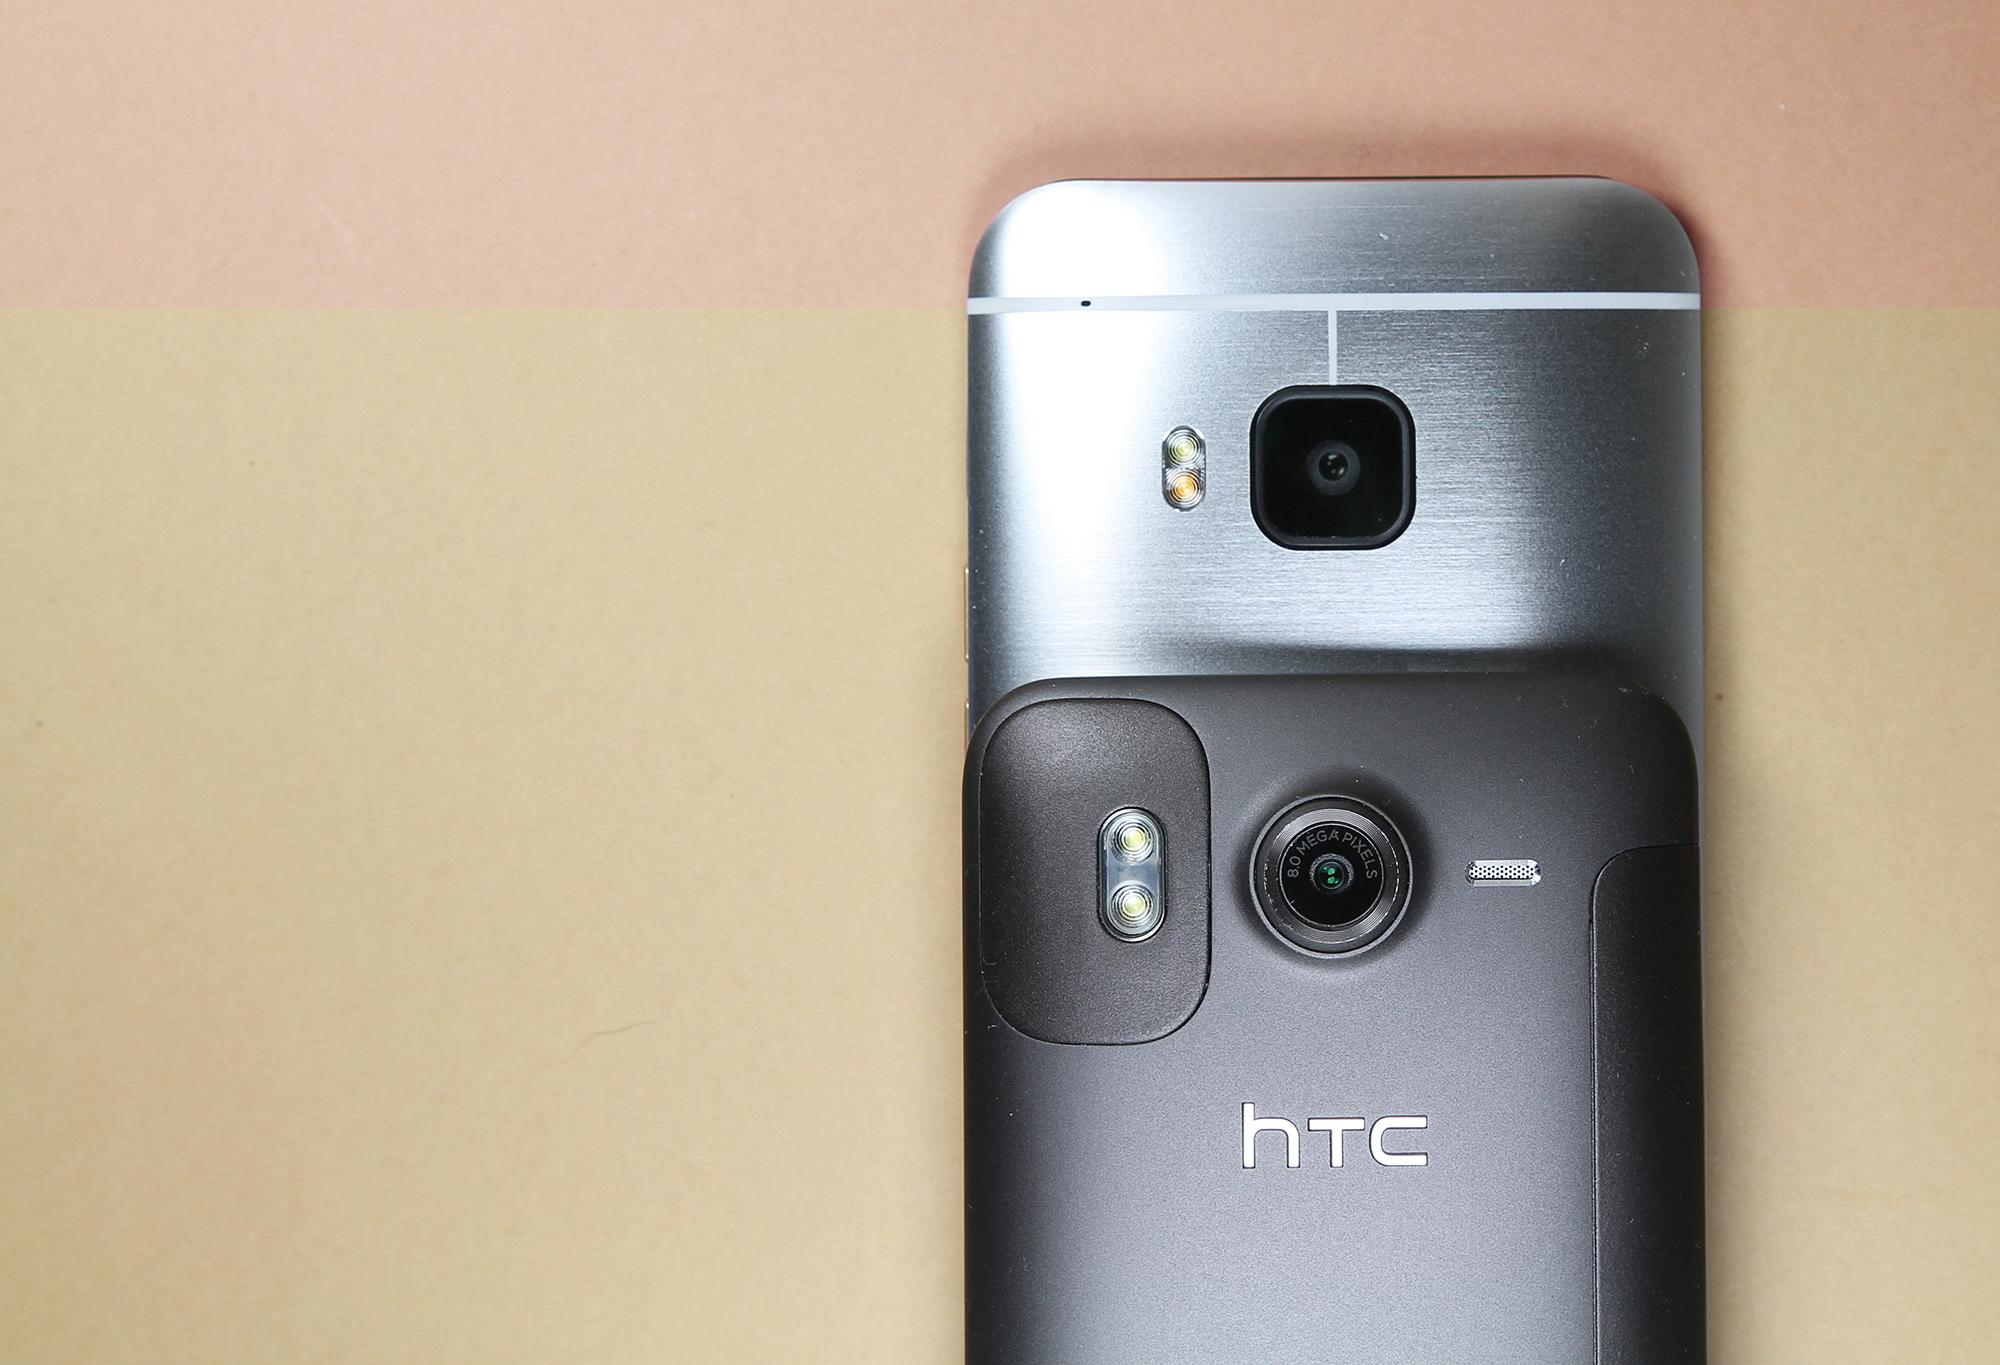 HTC One, tercera generación